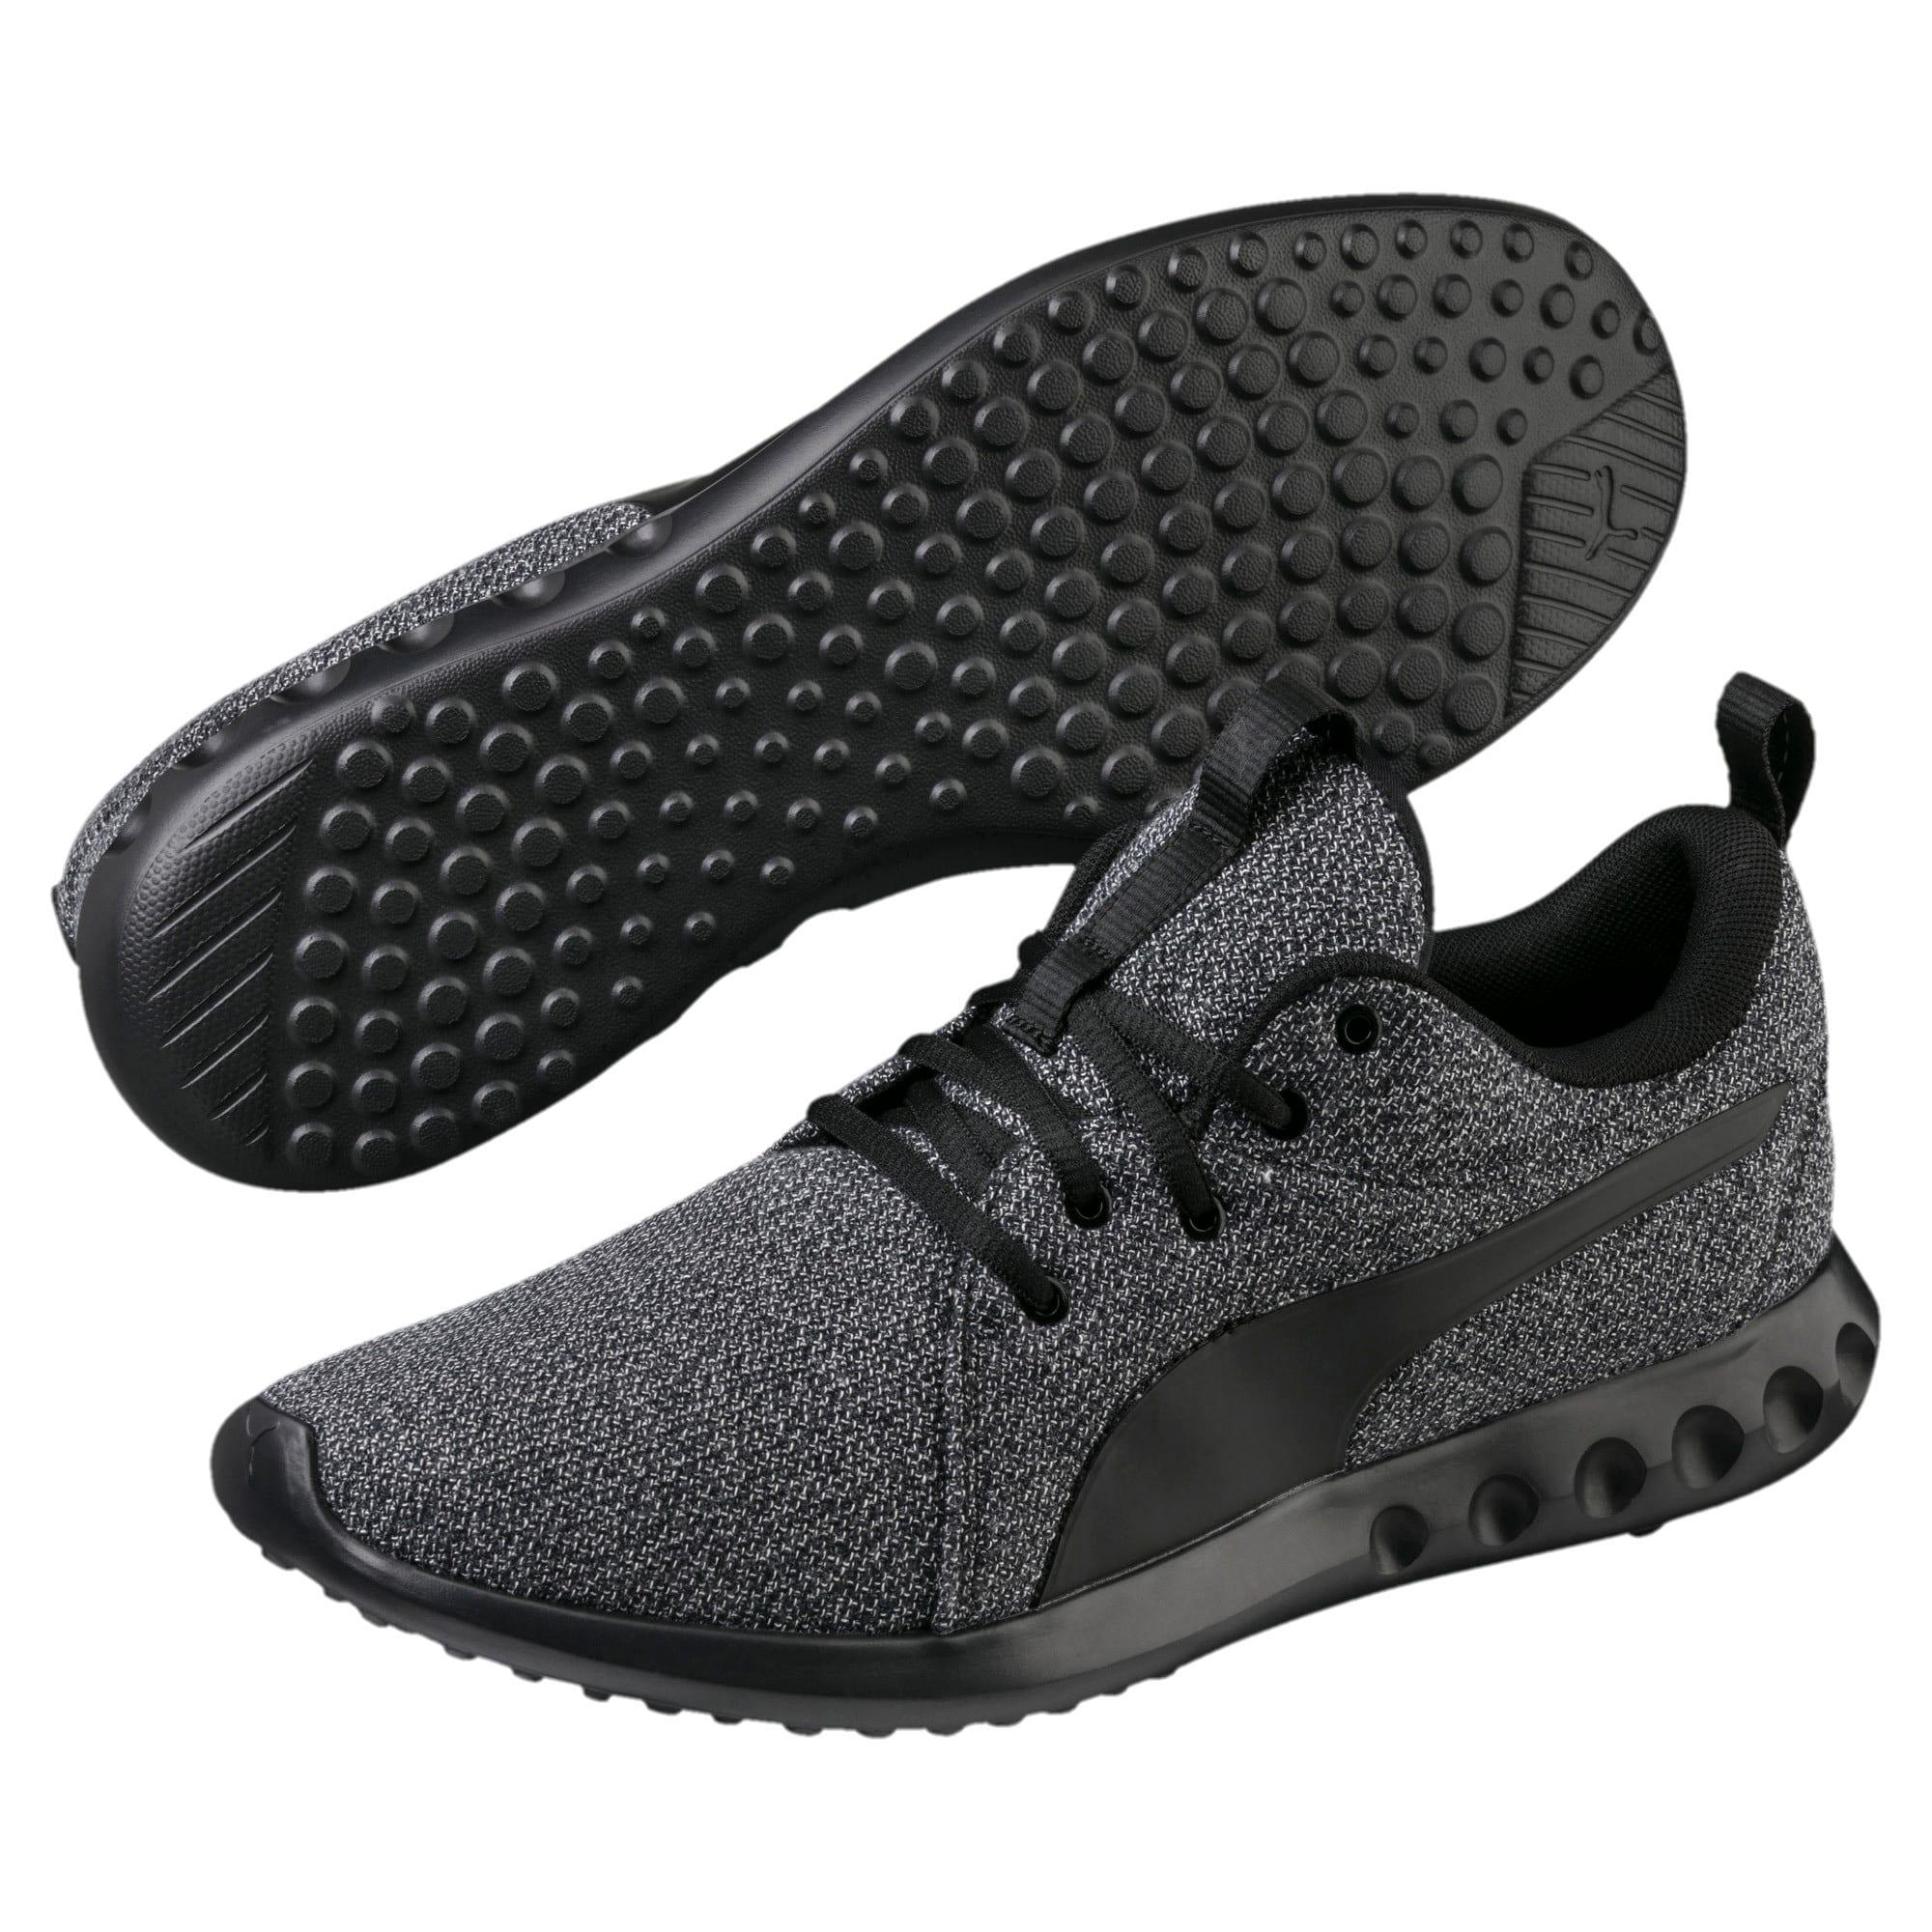 Thumbnail 2 of Carson 2 Knit Men's Training Shoes, Puma Black-Puma Black, medium